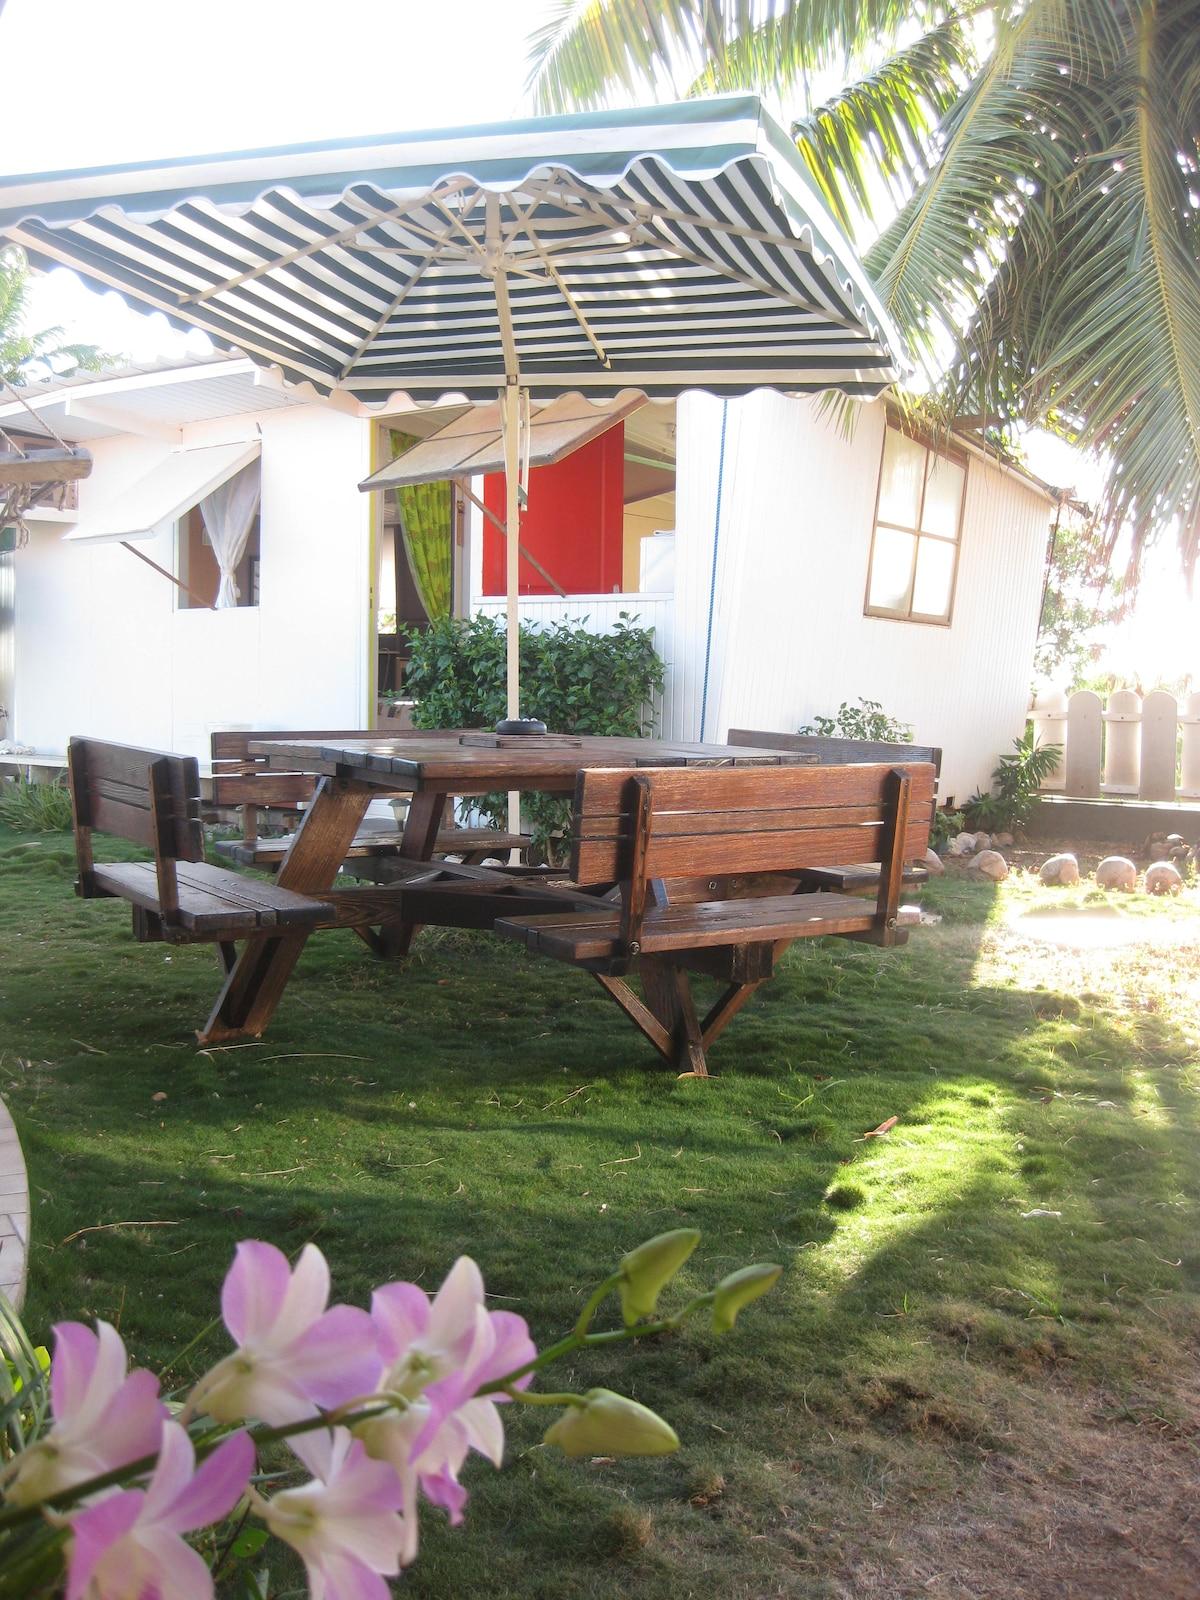 Iaorana in My Little Fare, Papeete